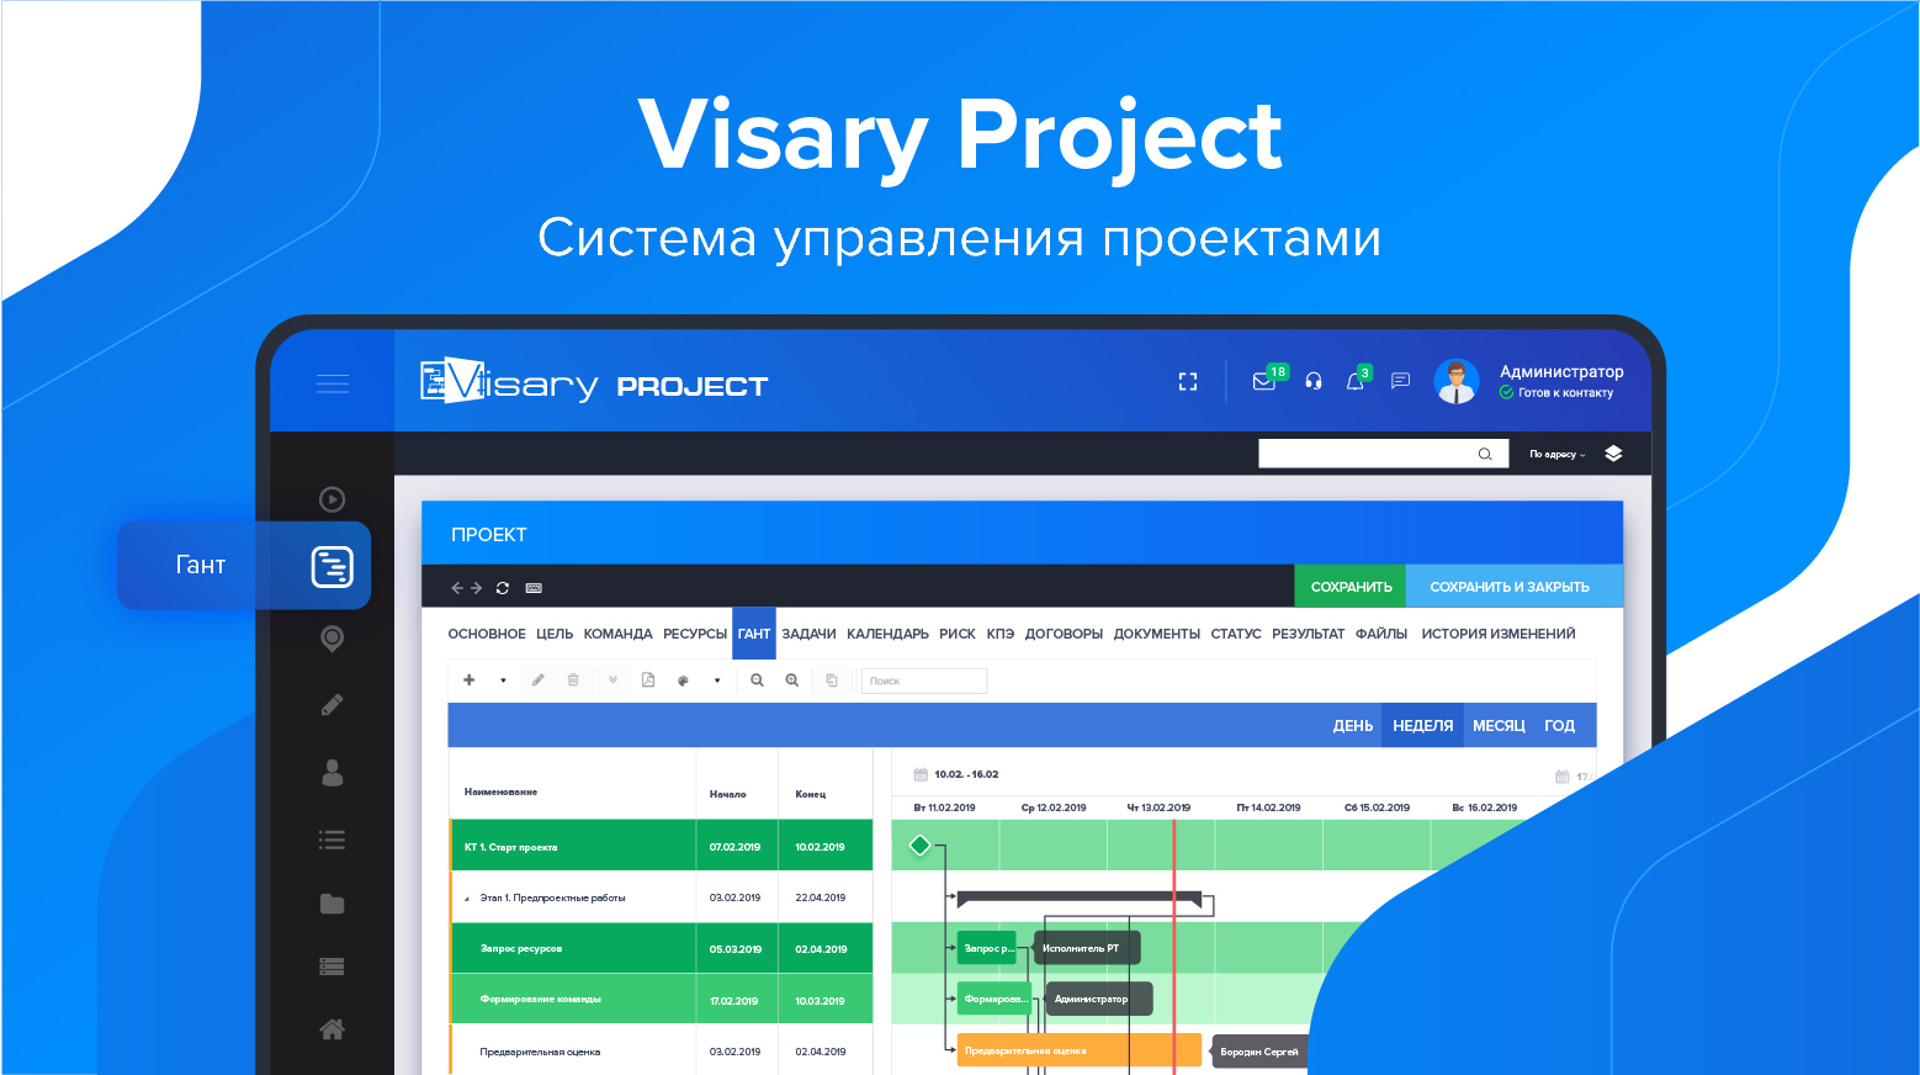 Visary Project